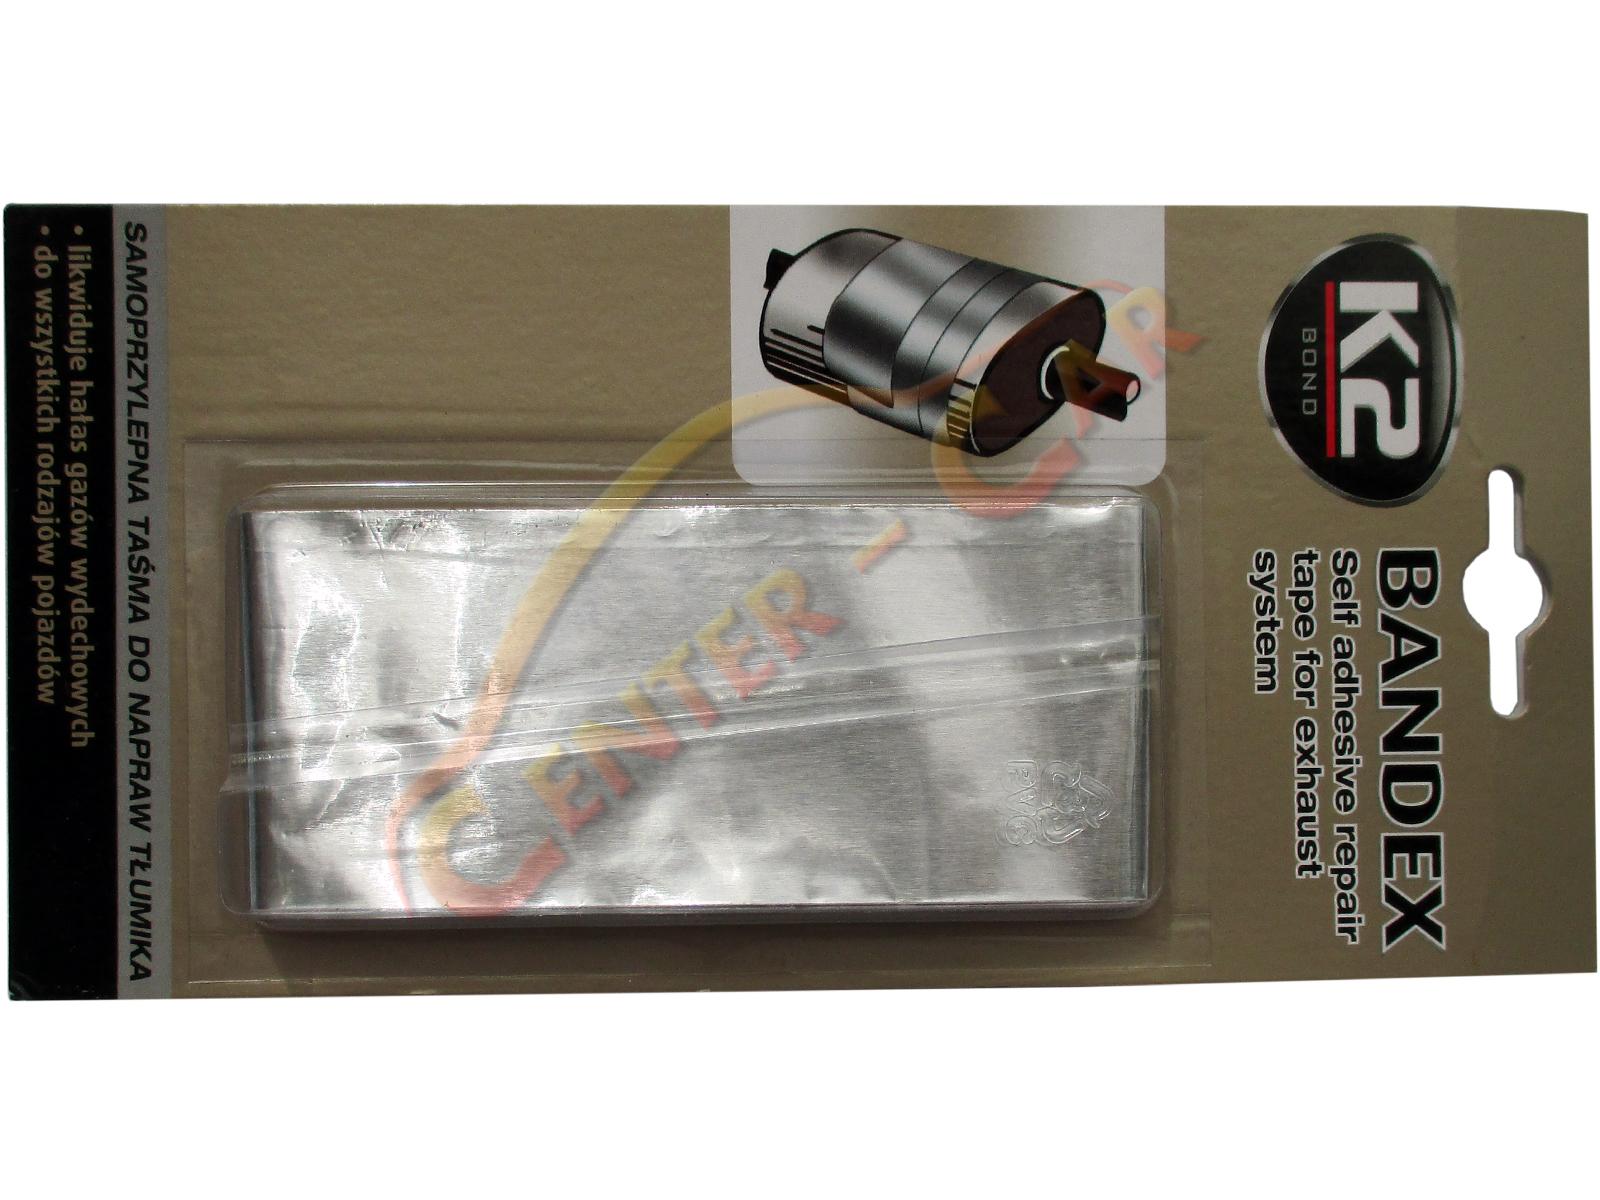 original k2 bandex reparaturband auspuff reparatur klebeband 1m ebay. Black Bedroom Furniture Sets. Home Design Ideas